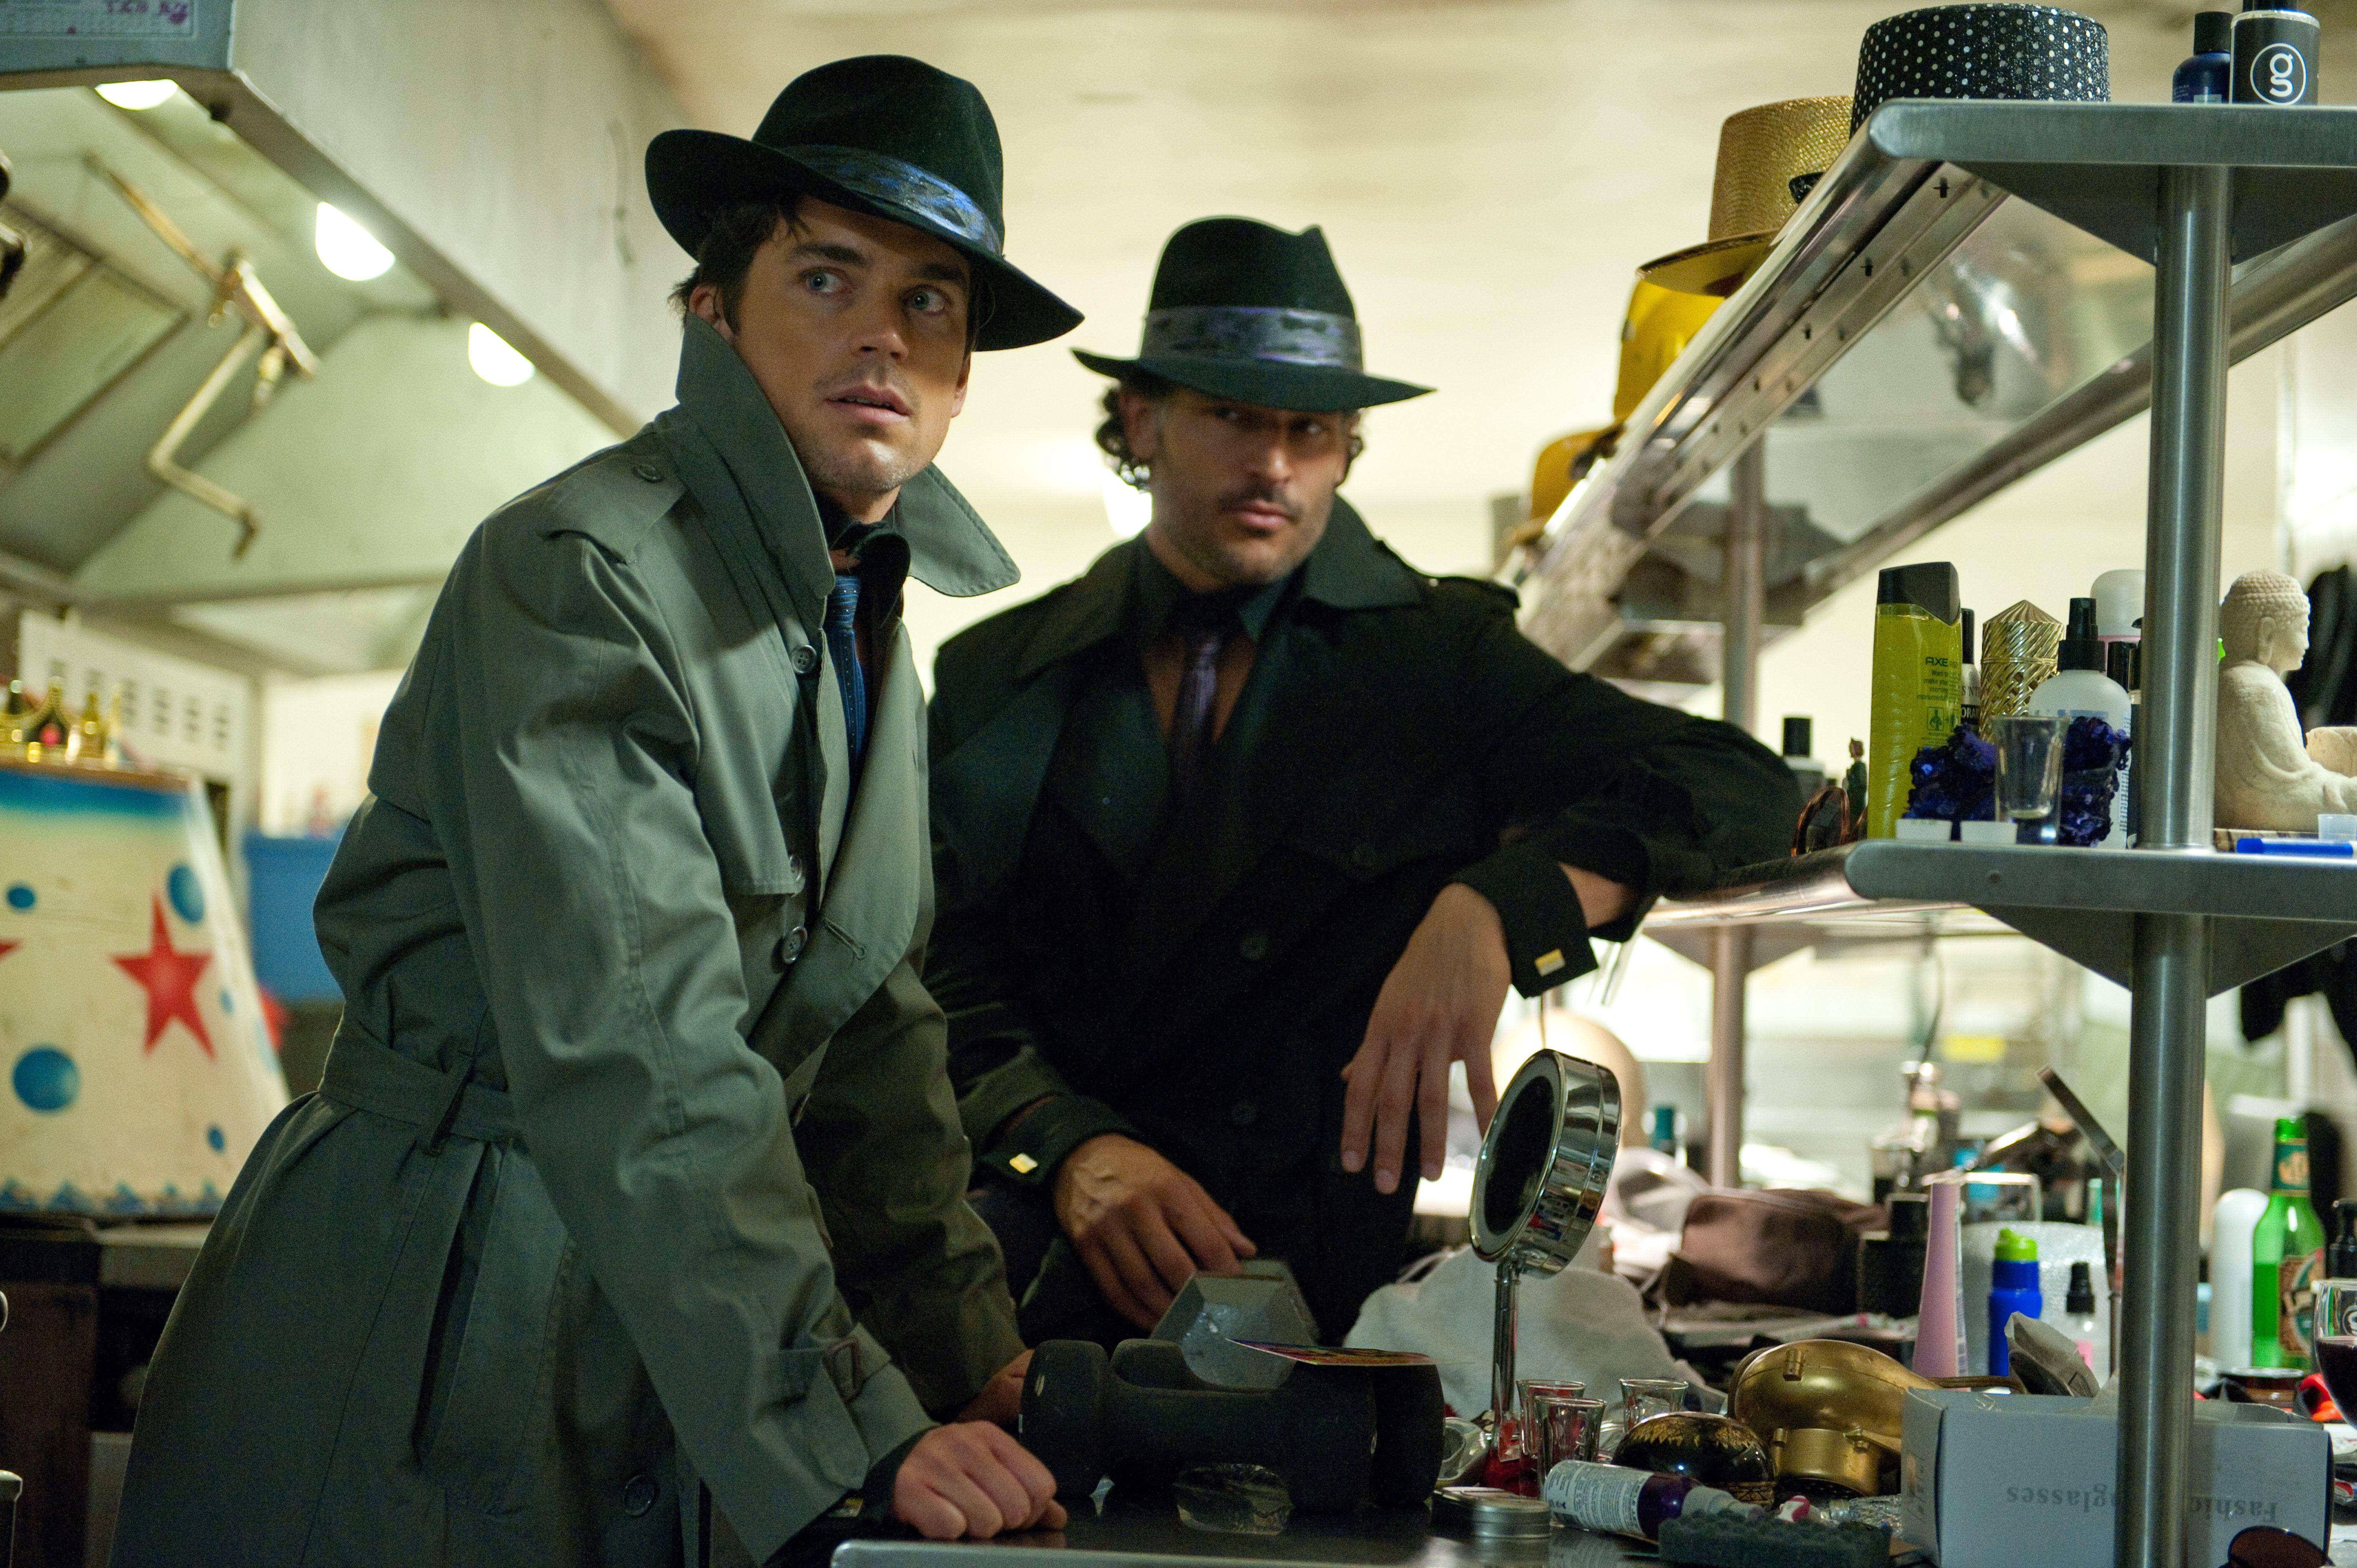 Big Dick Richie (Joe Manganiello) and Ken (Matt Bomer) #MagicMike